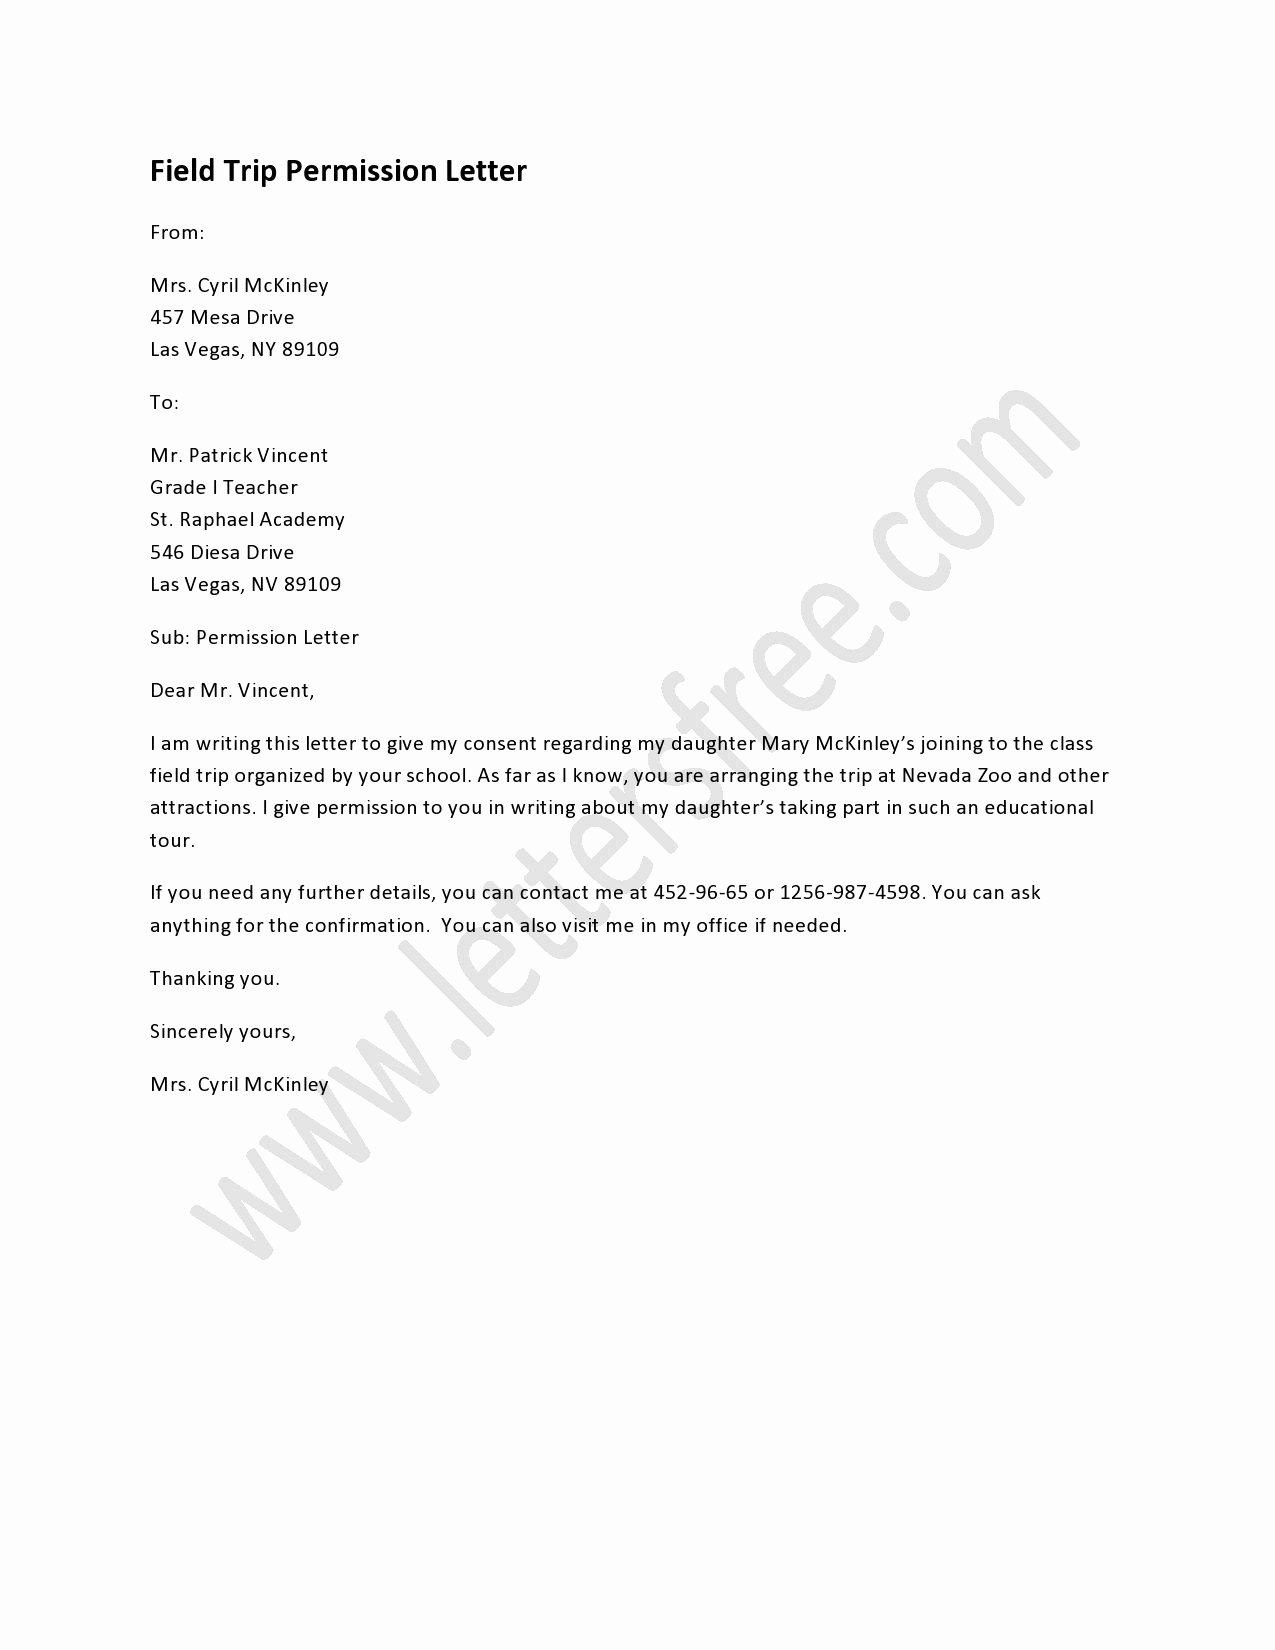 Field Trip Letter Template Luxury A Field Trip Permission Letter is Written to Permit An